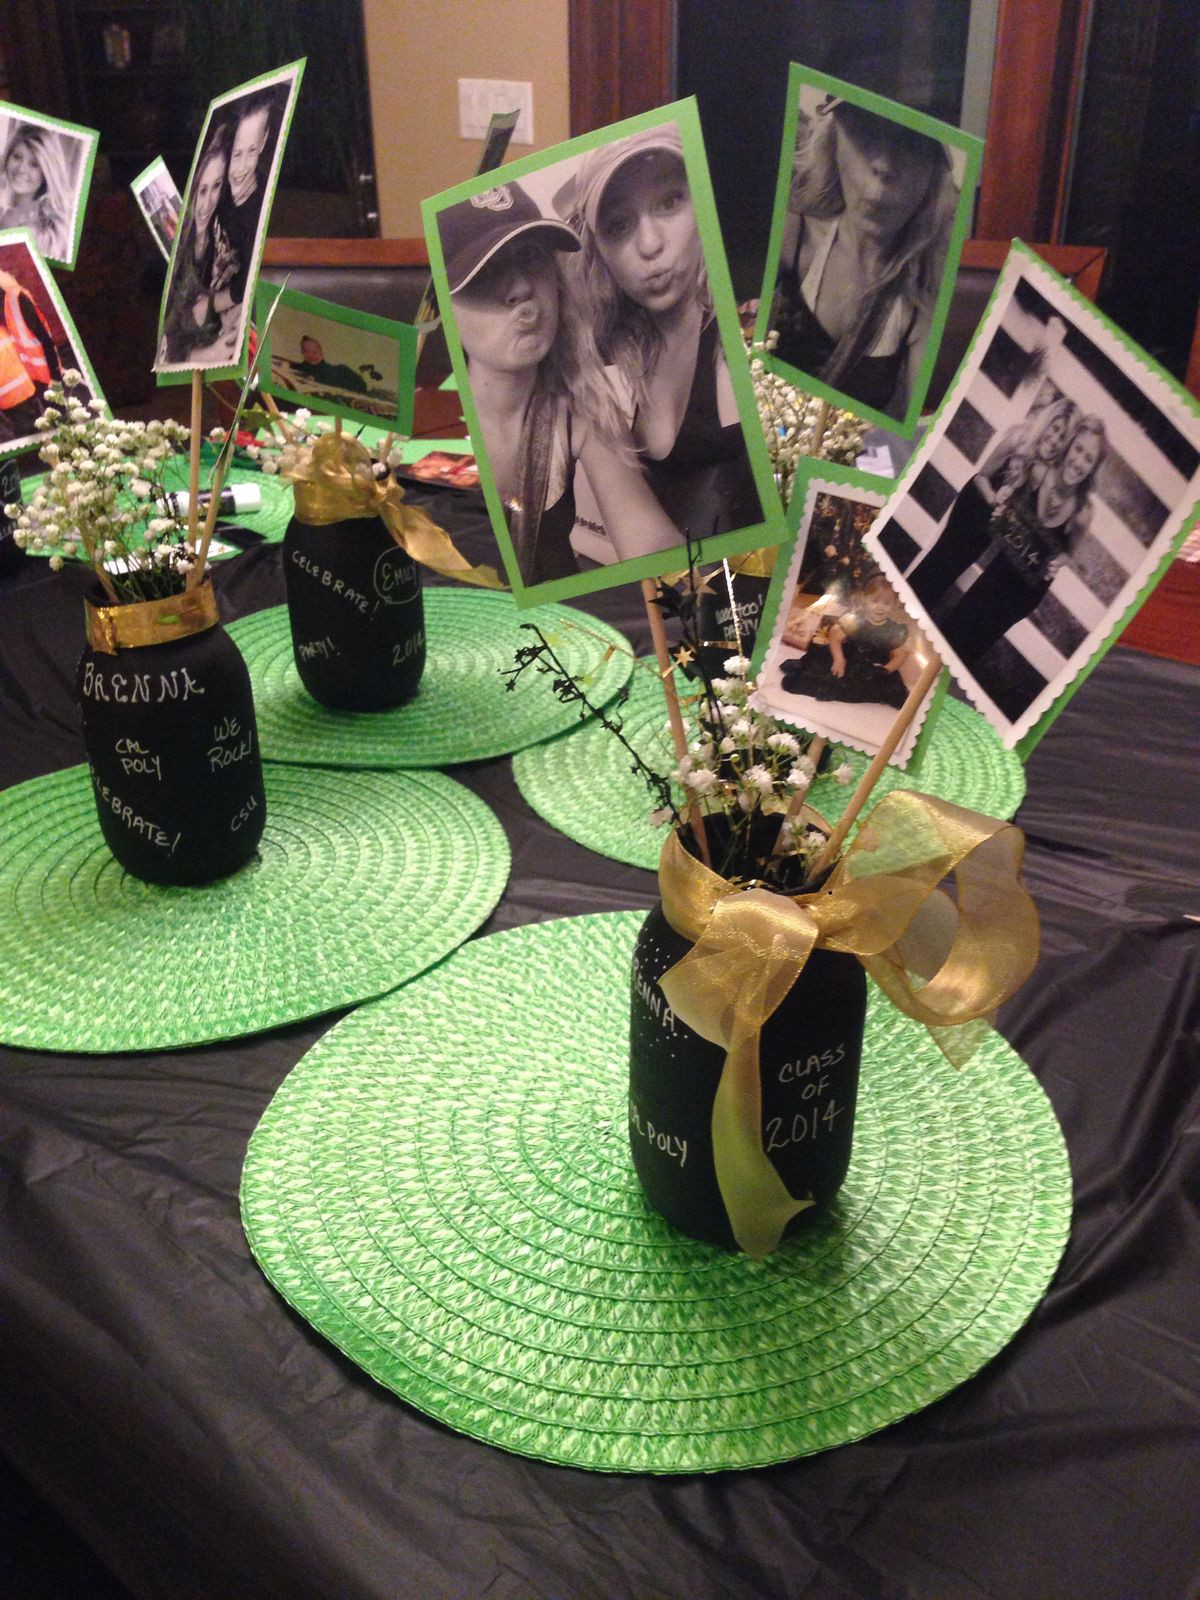 Centerpiece Ideas For Graduation Party  graduation centerpieces for guys